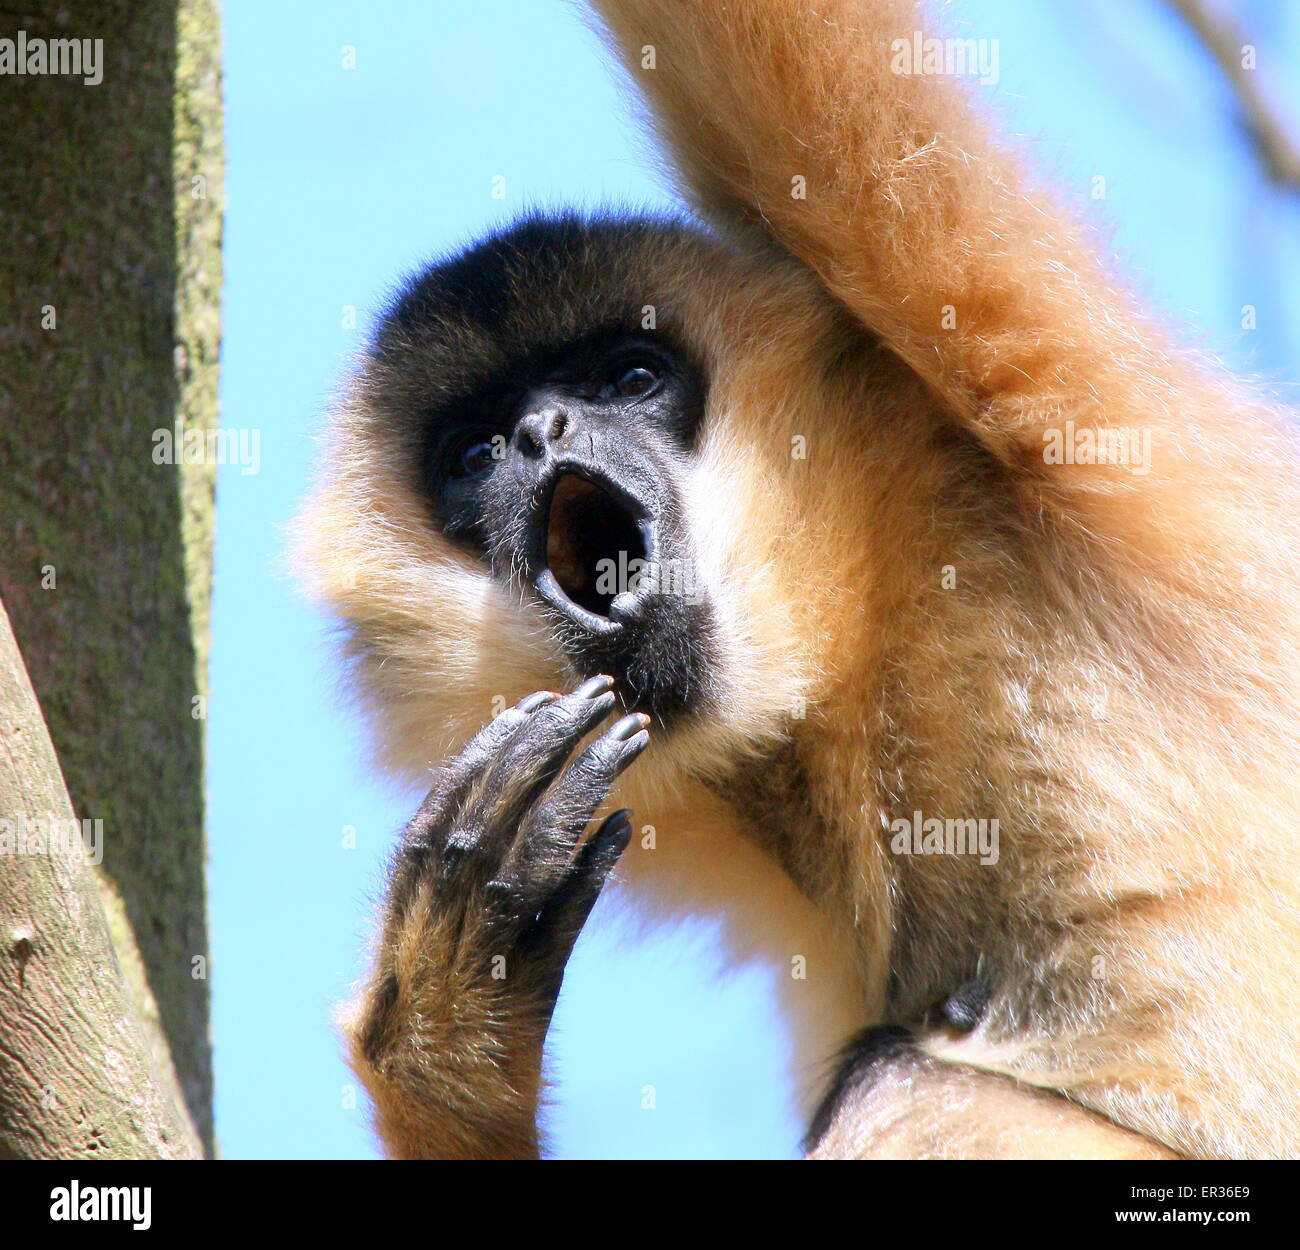 Female Southeast Asian Northern white cheeked gibbon (Nomascus leucogenys) howling loudly - Stock Image